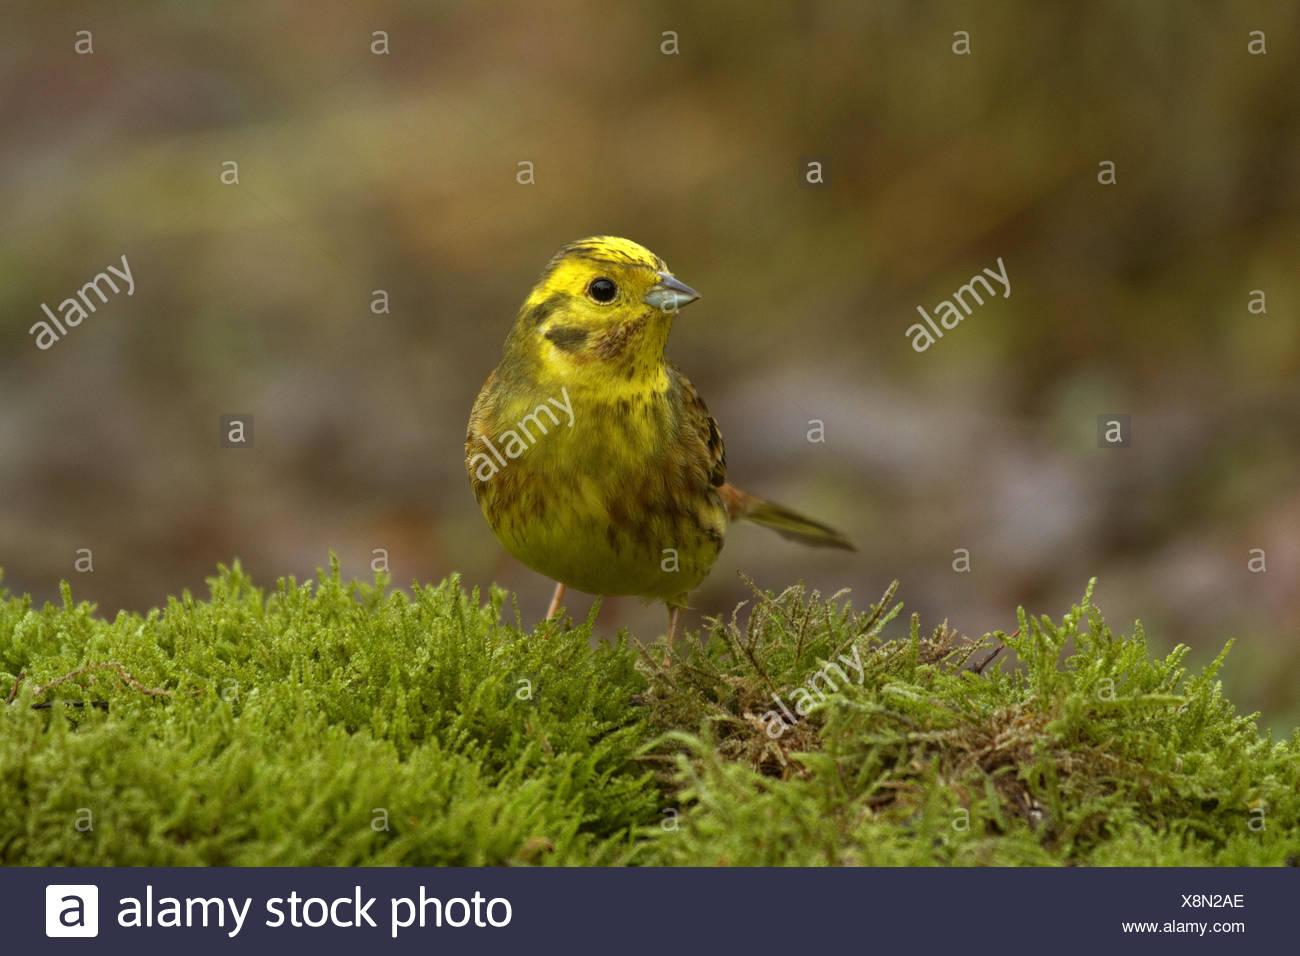 yellowhammer (Emberiza citrinella), sitting on moss, Germany - Stock Image